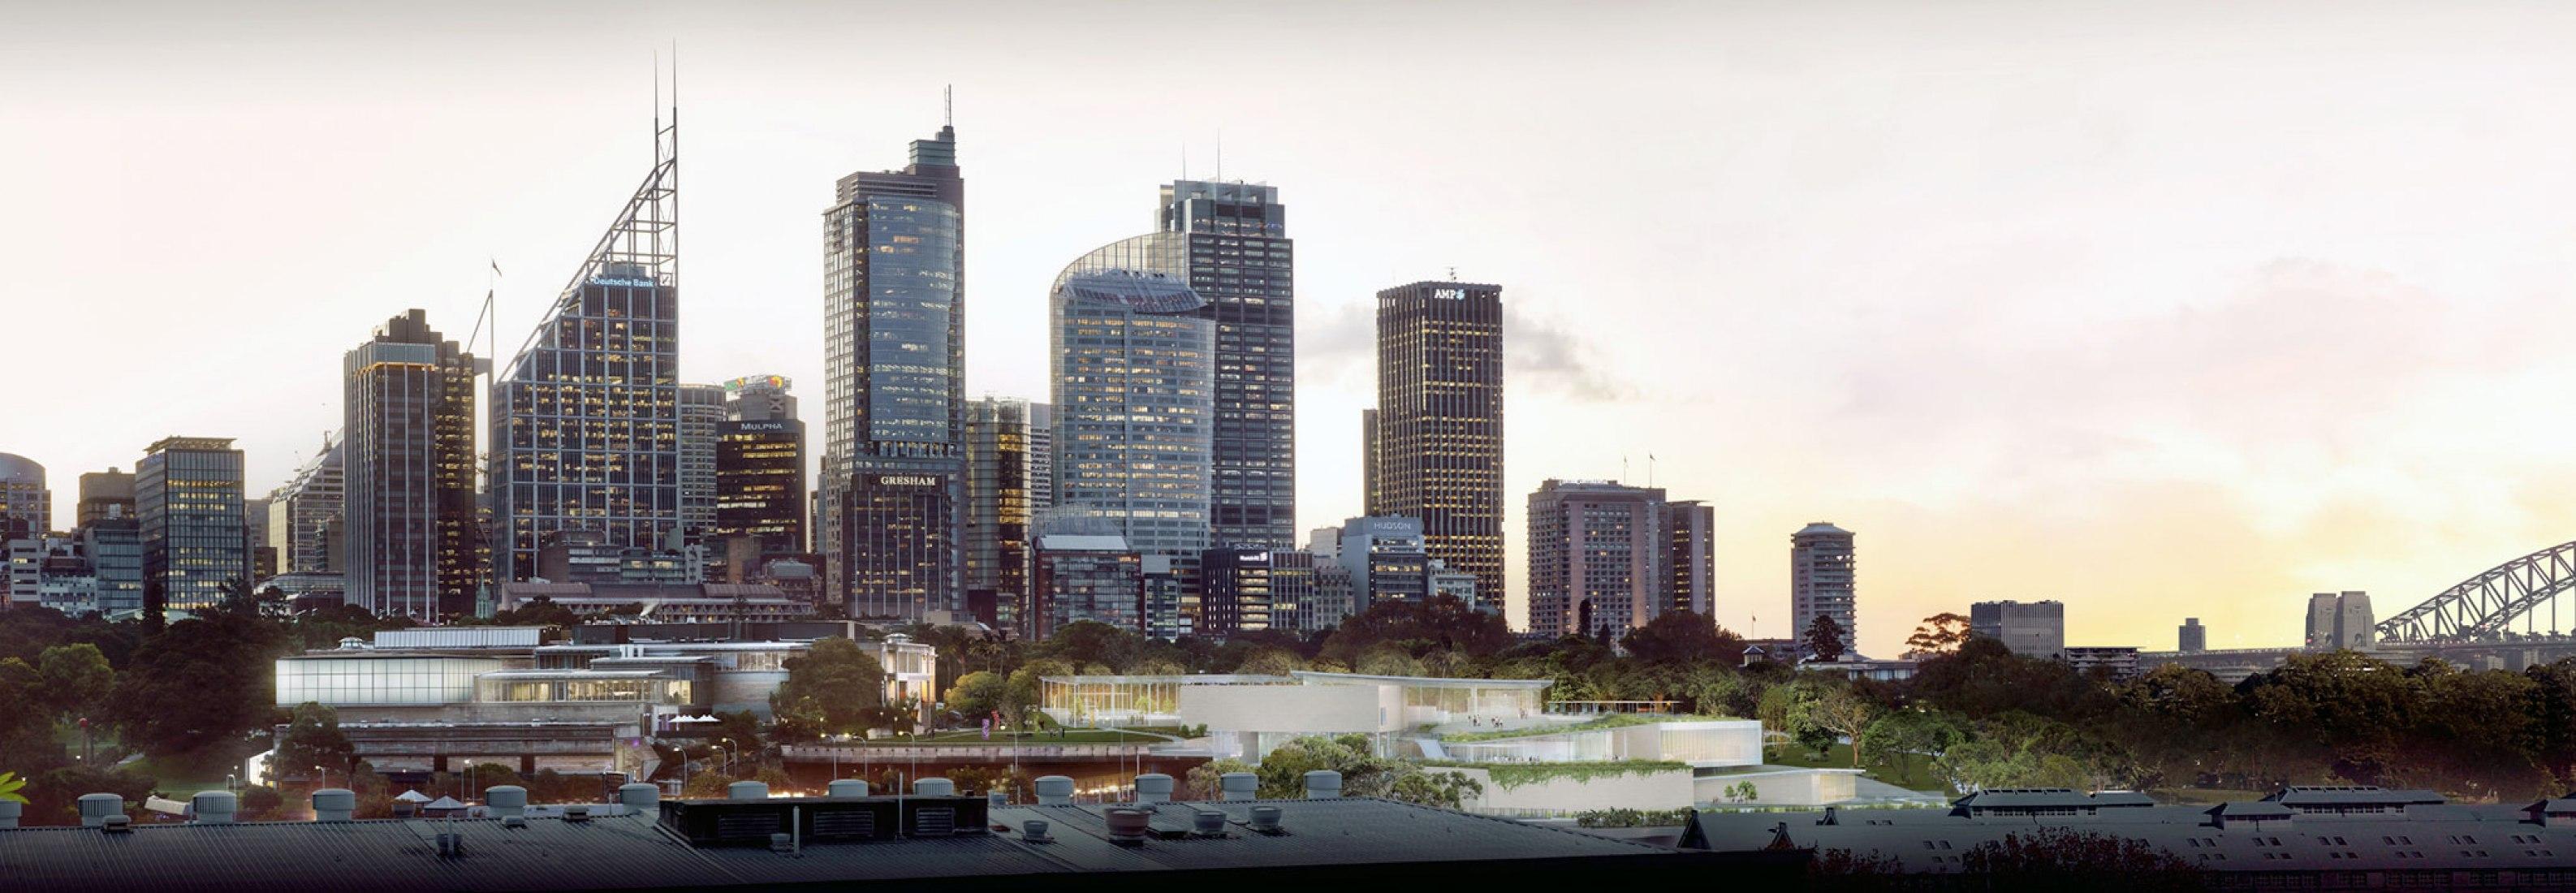 Imagen del Sydney Modern Project: vista aérea por Kazuyo Sejima + Ryue Nishizawa / SANAA